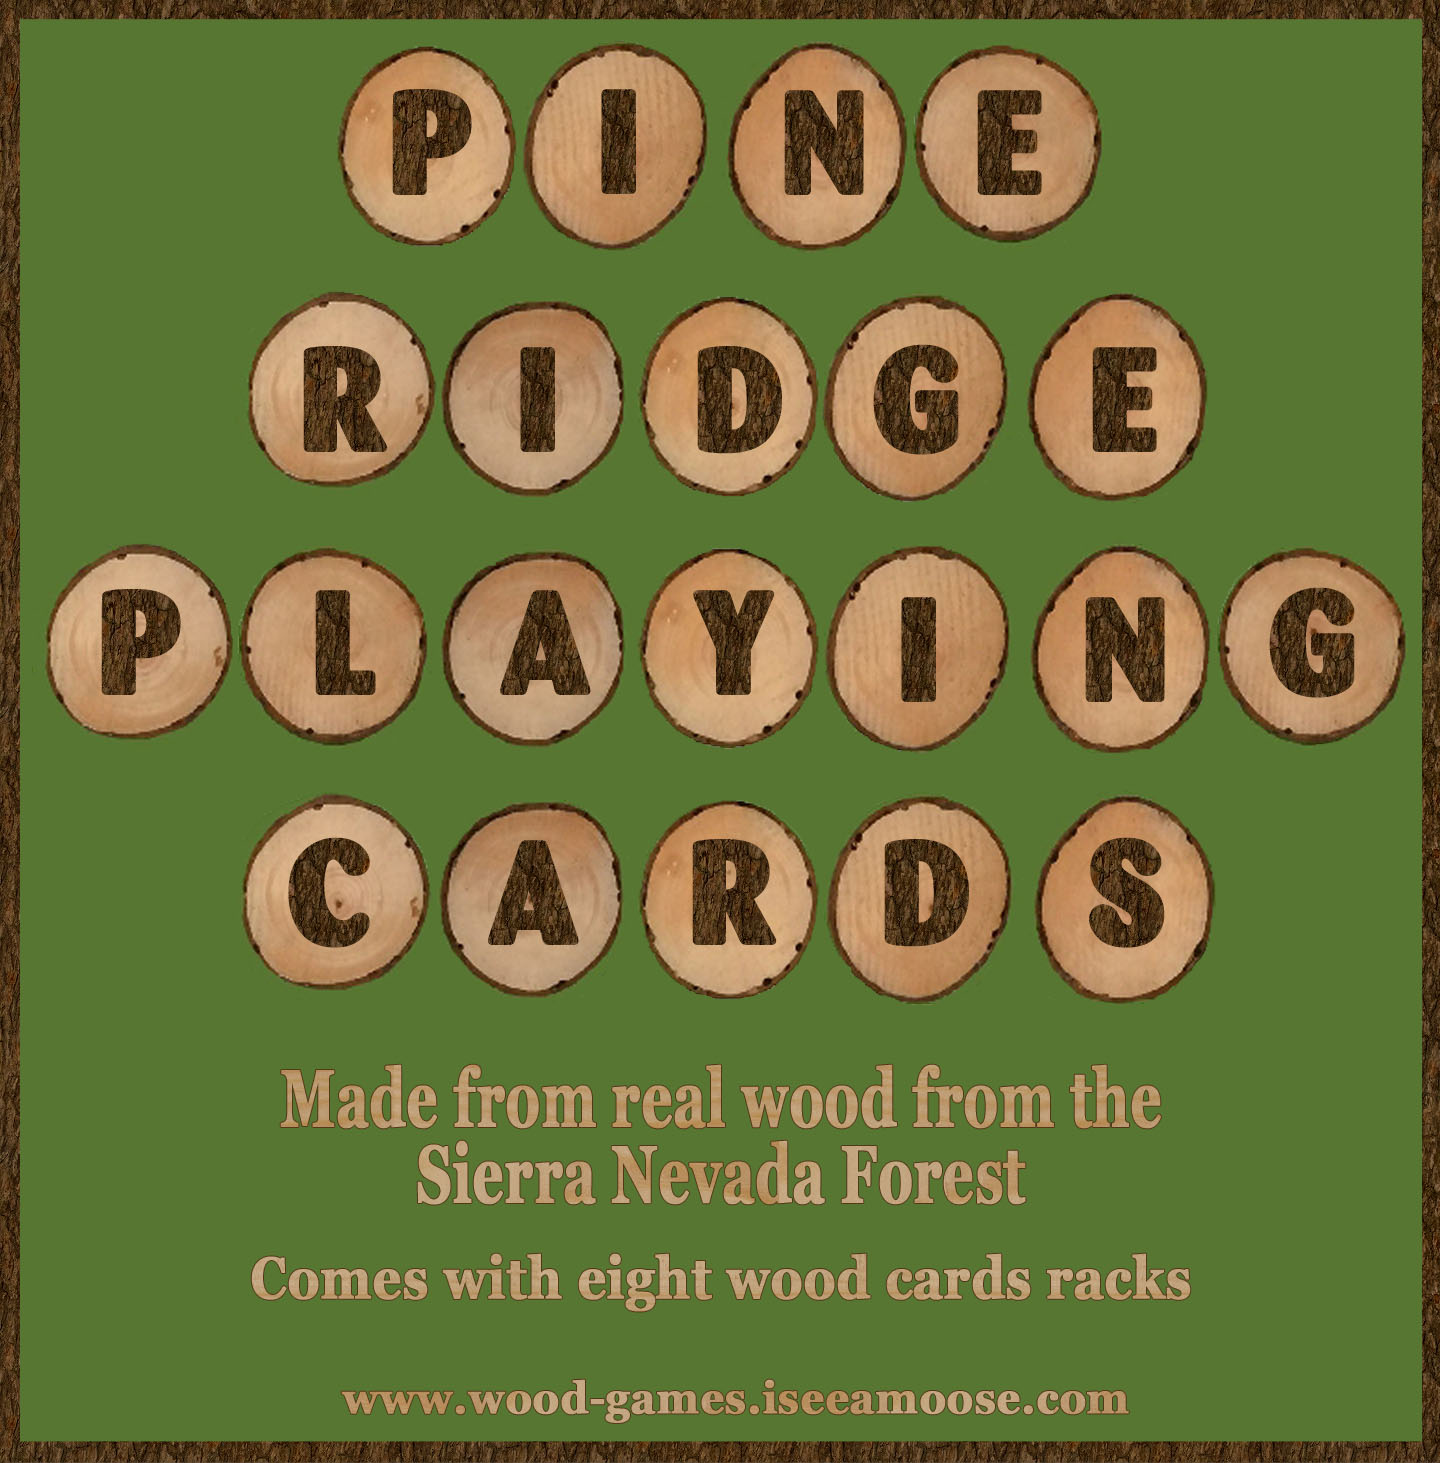 www.wood-games.iseeamoose.com